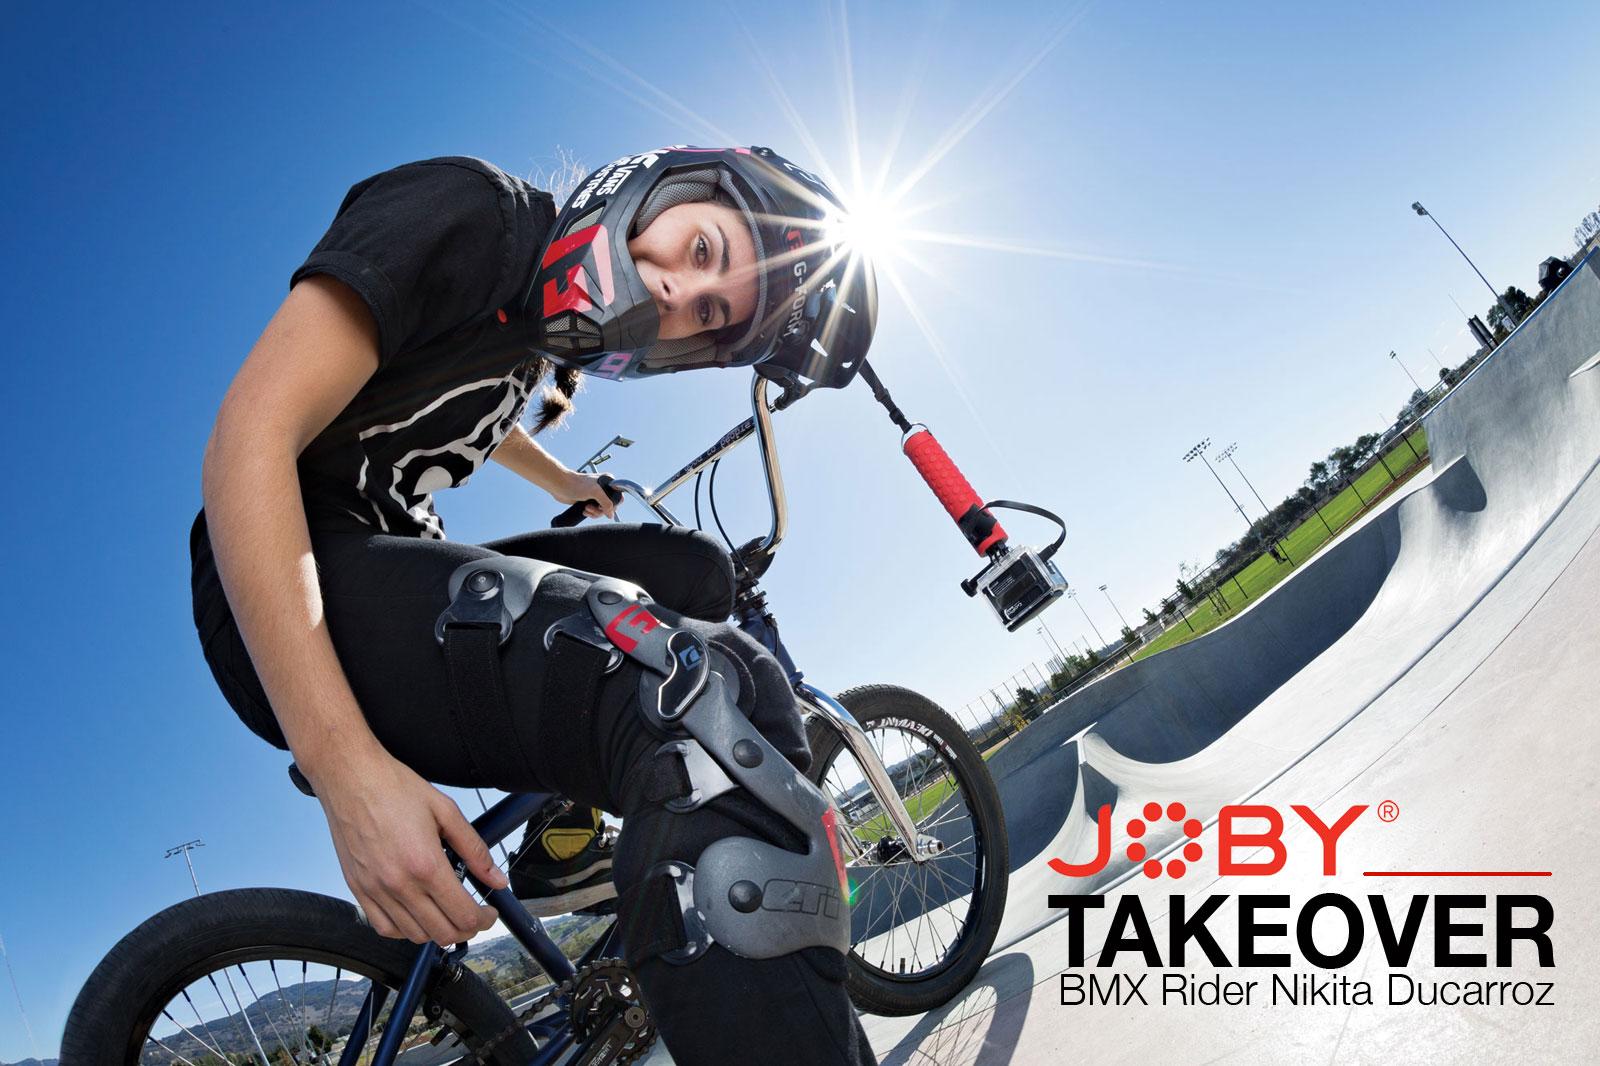 JOBY Takeover: BMX Rider Nikita Ducarroz